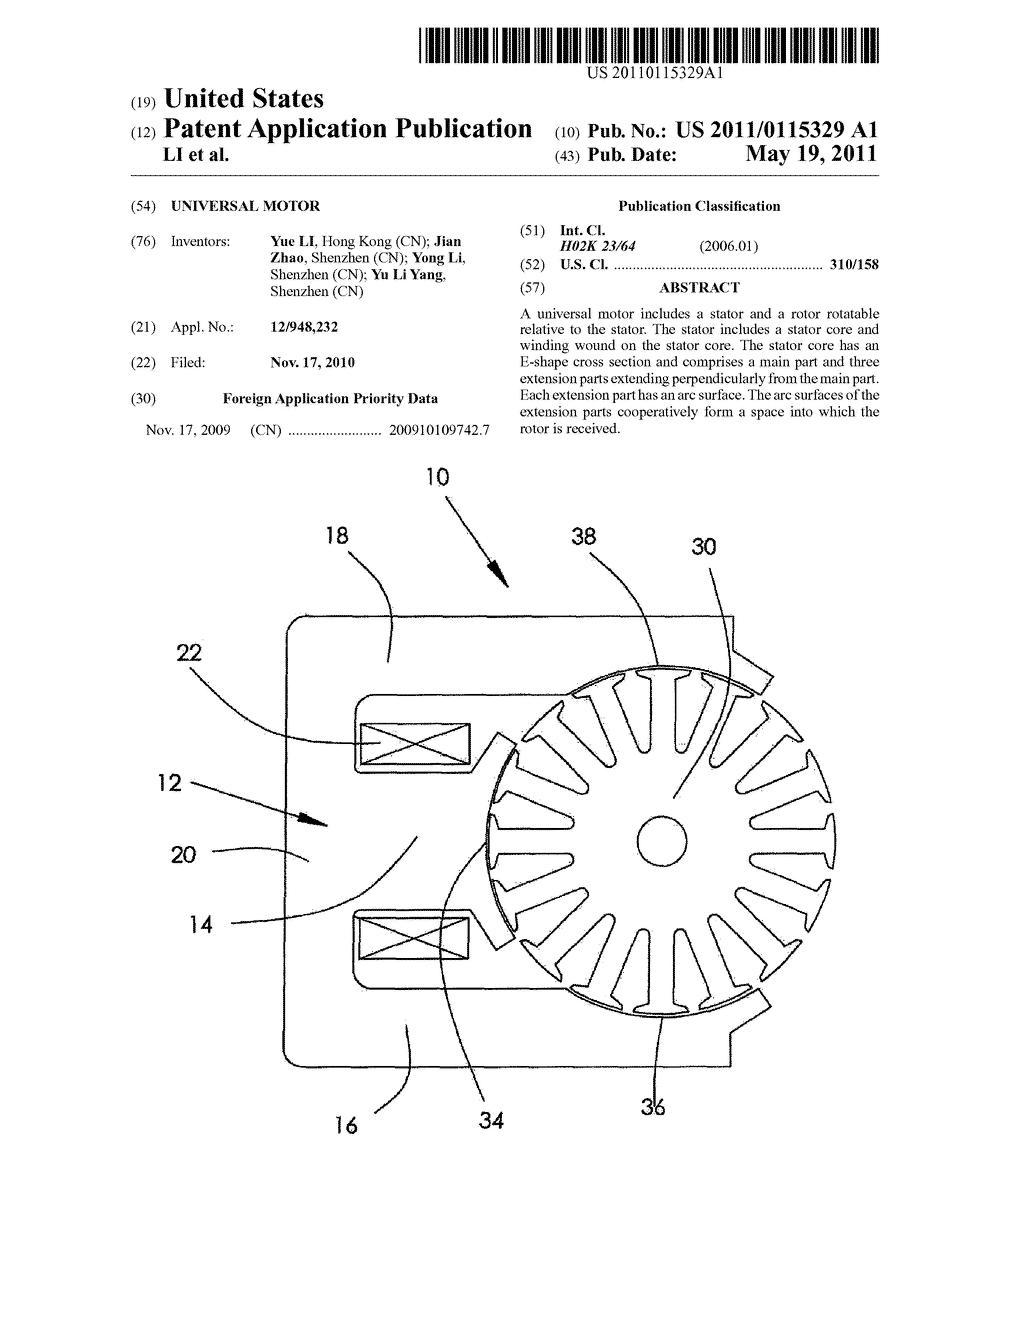 hight resolution of universal motor diagram 23 wiring diagram images magnetek universal electric motor wiring diagram magnetek universal electric